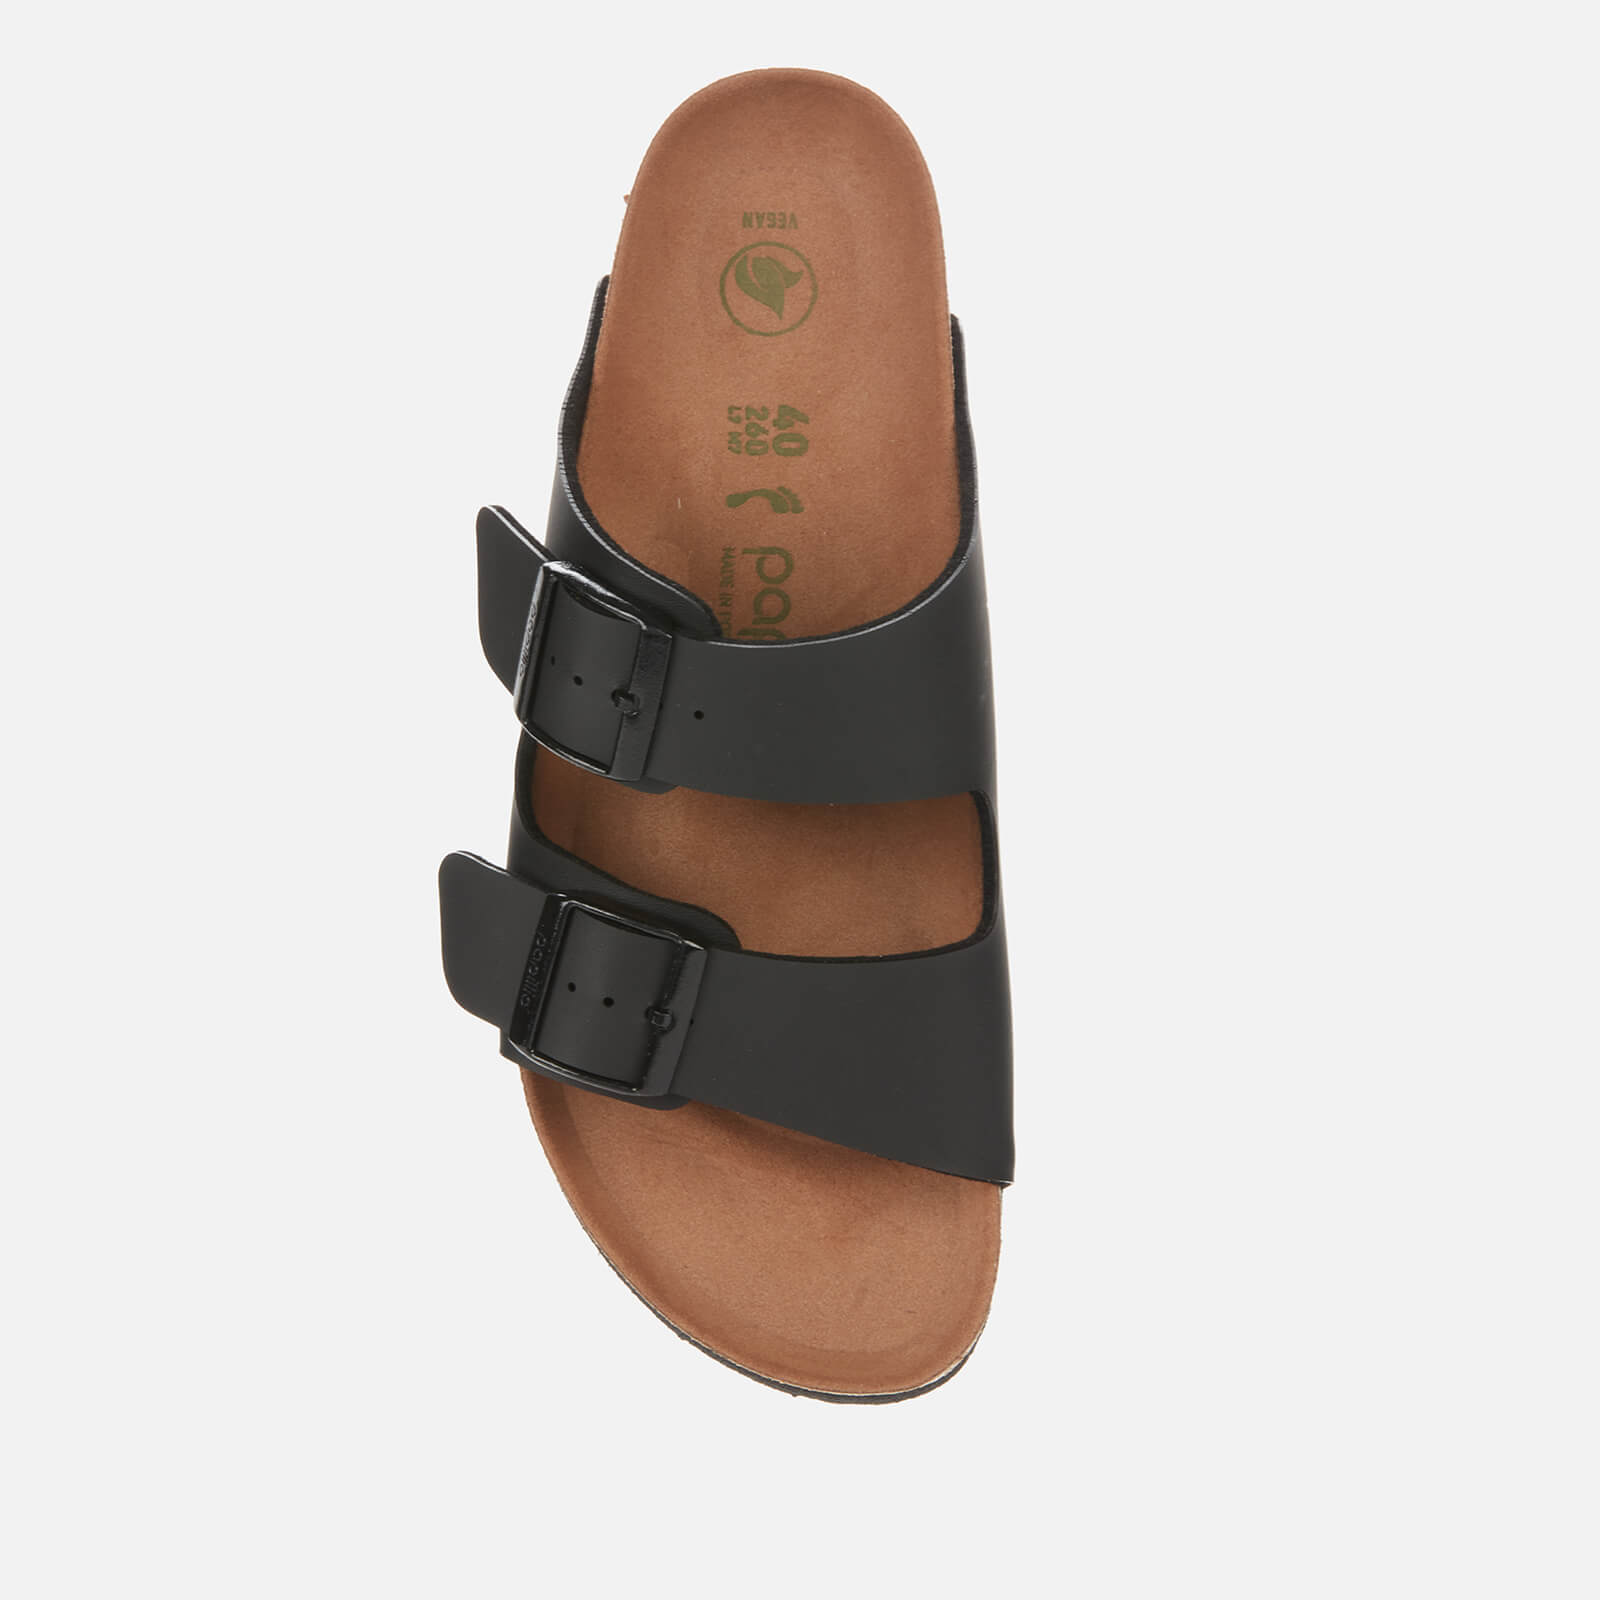 Birkenstock Women's Papillio Vegan Arizona Platform Double Strap Sandals - Black - Eu 39/Uk 5.5